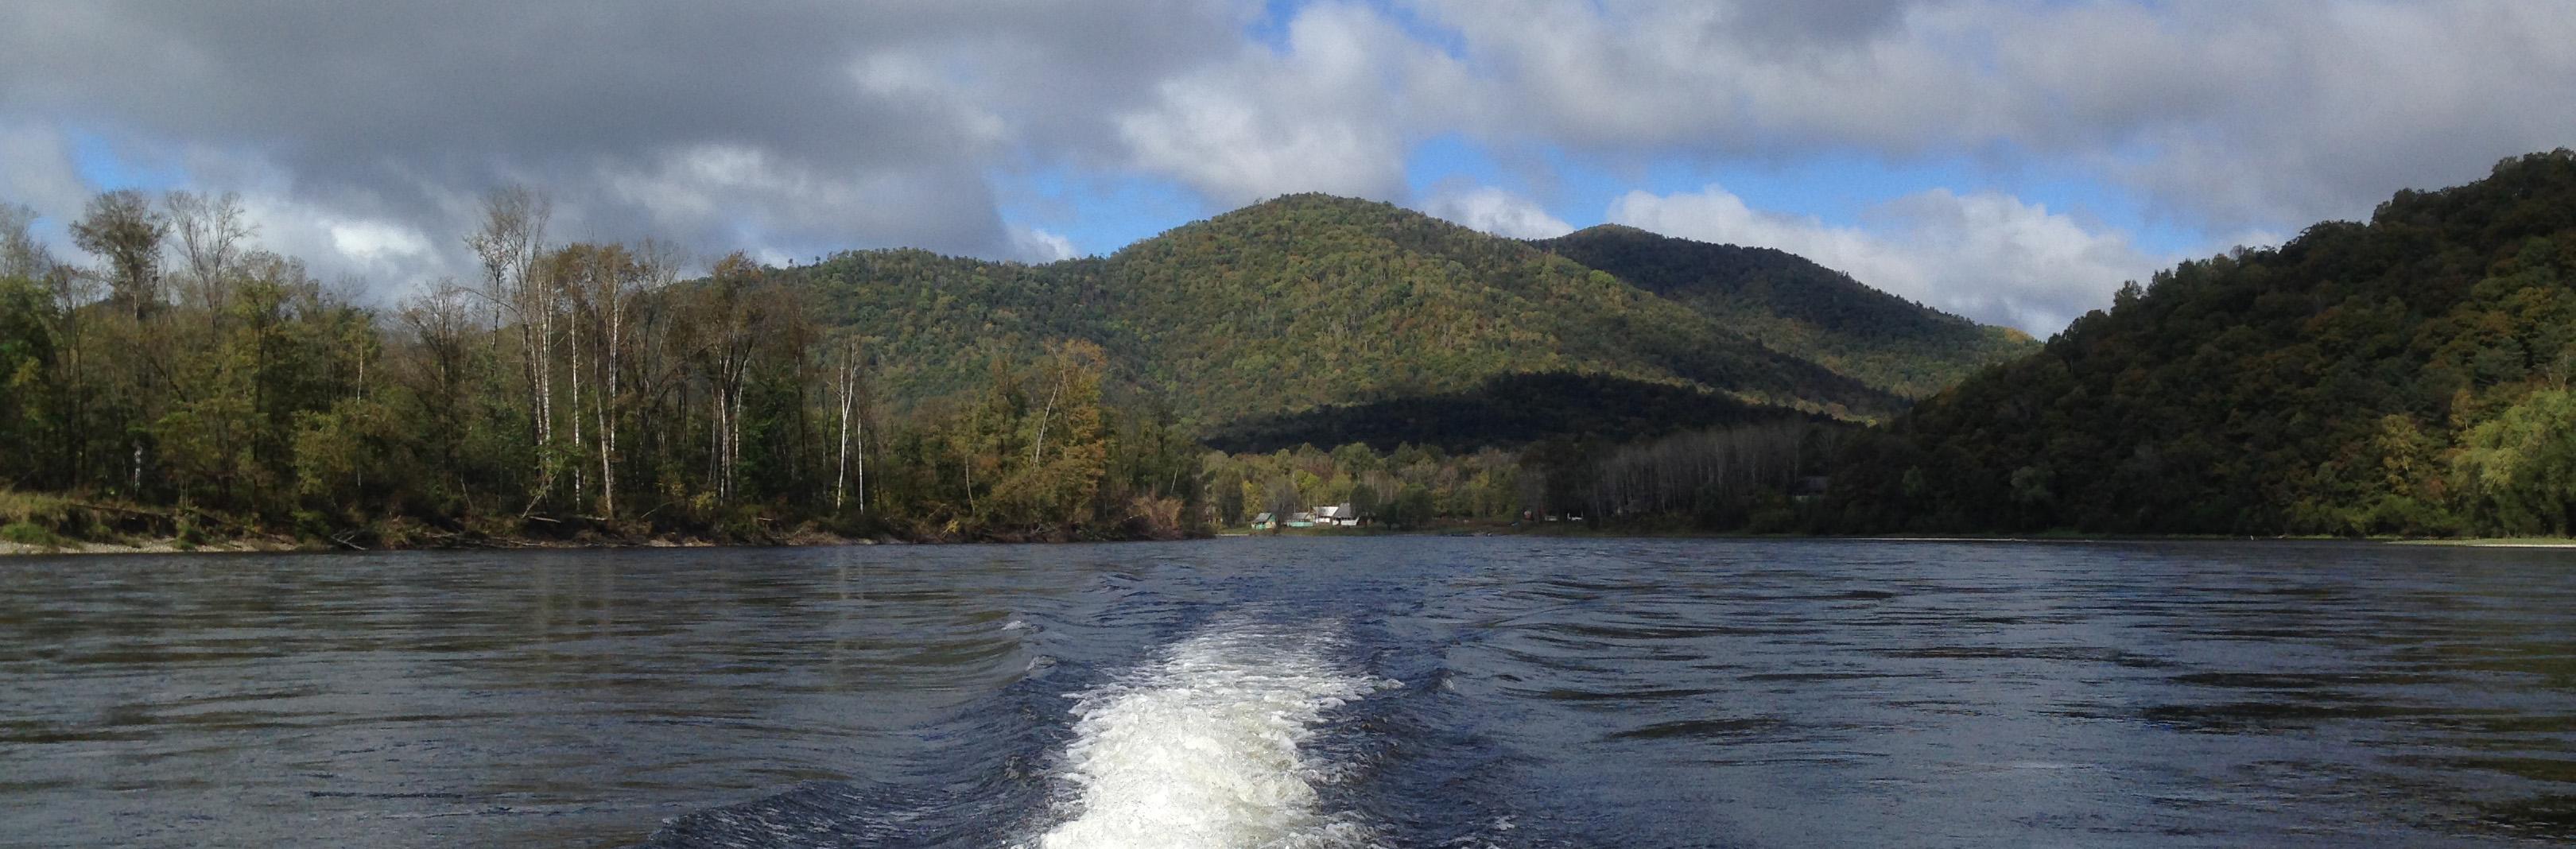 Khor river